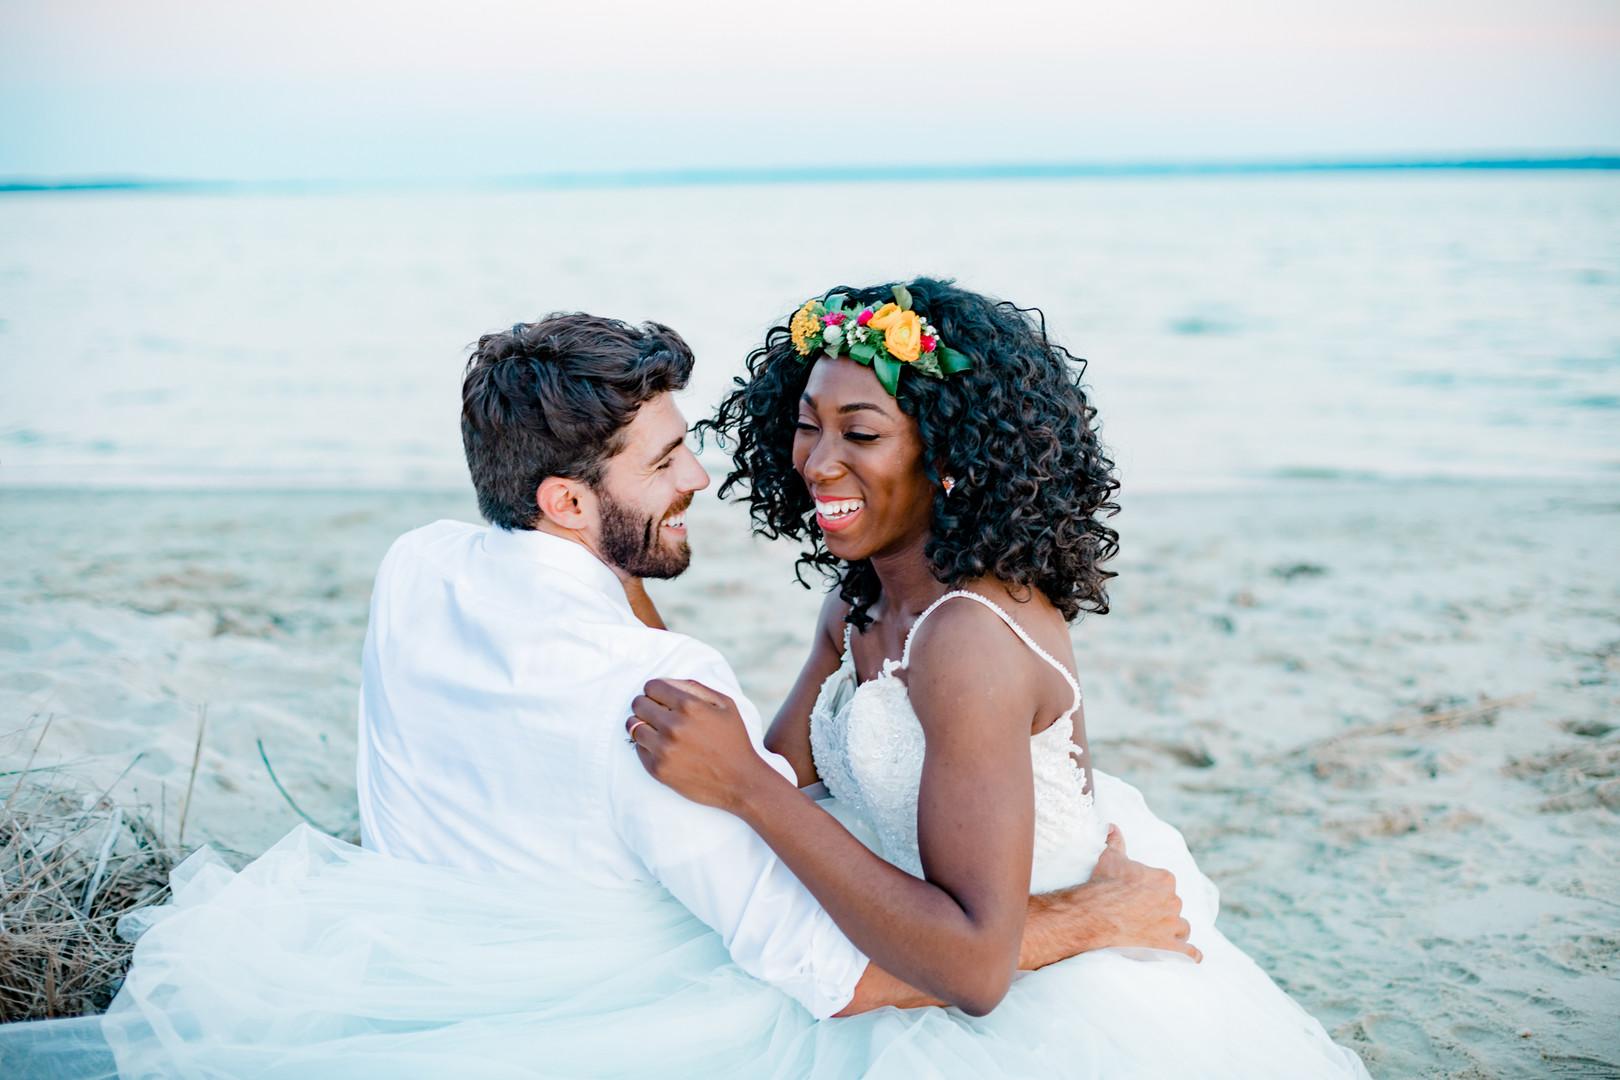 interracial couple on beach